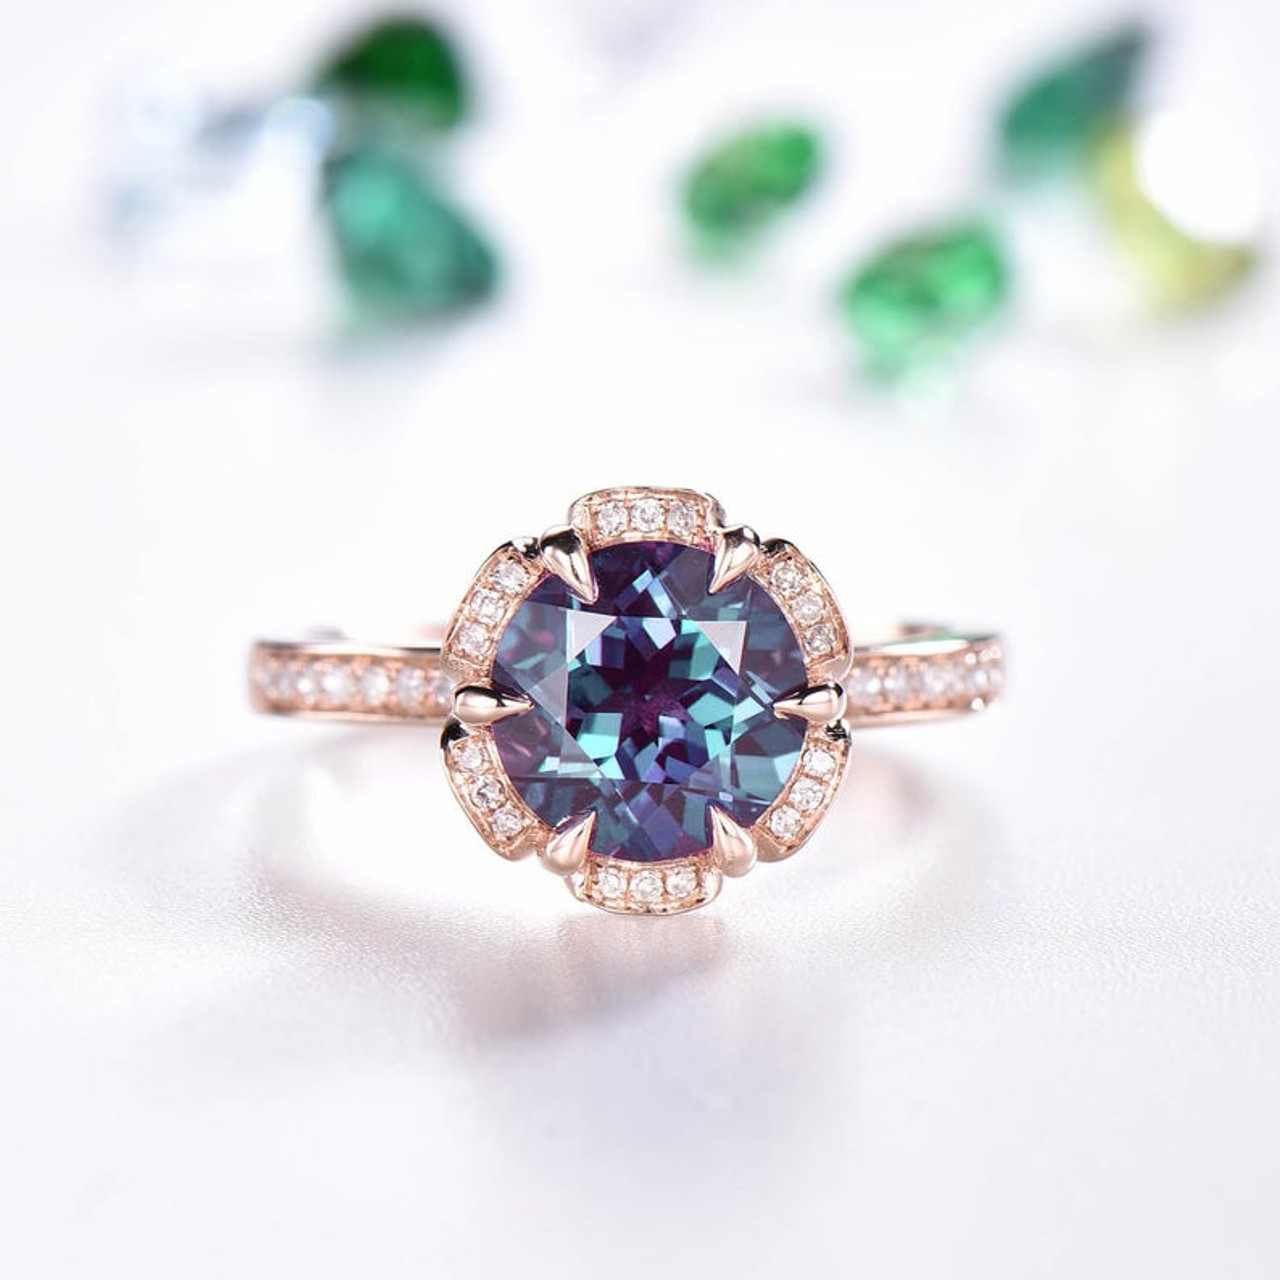 Vintage Alexandrite Engagement Ring Art Deco Flower Halo